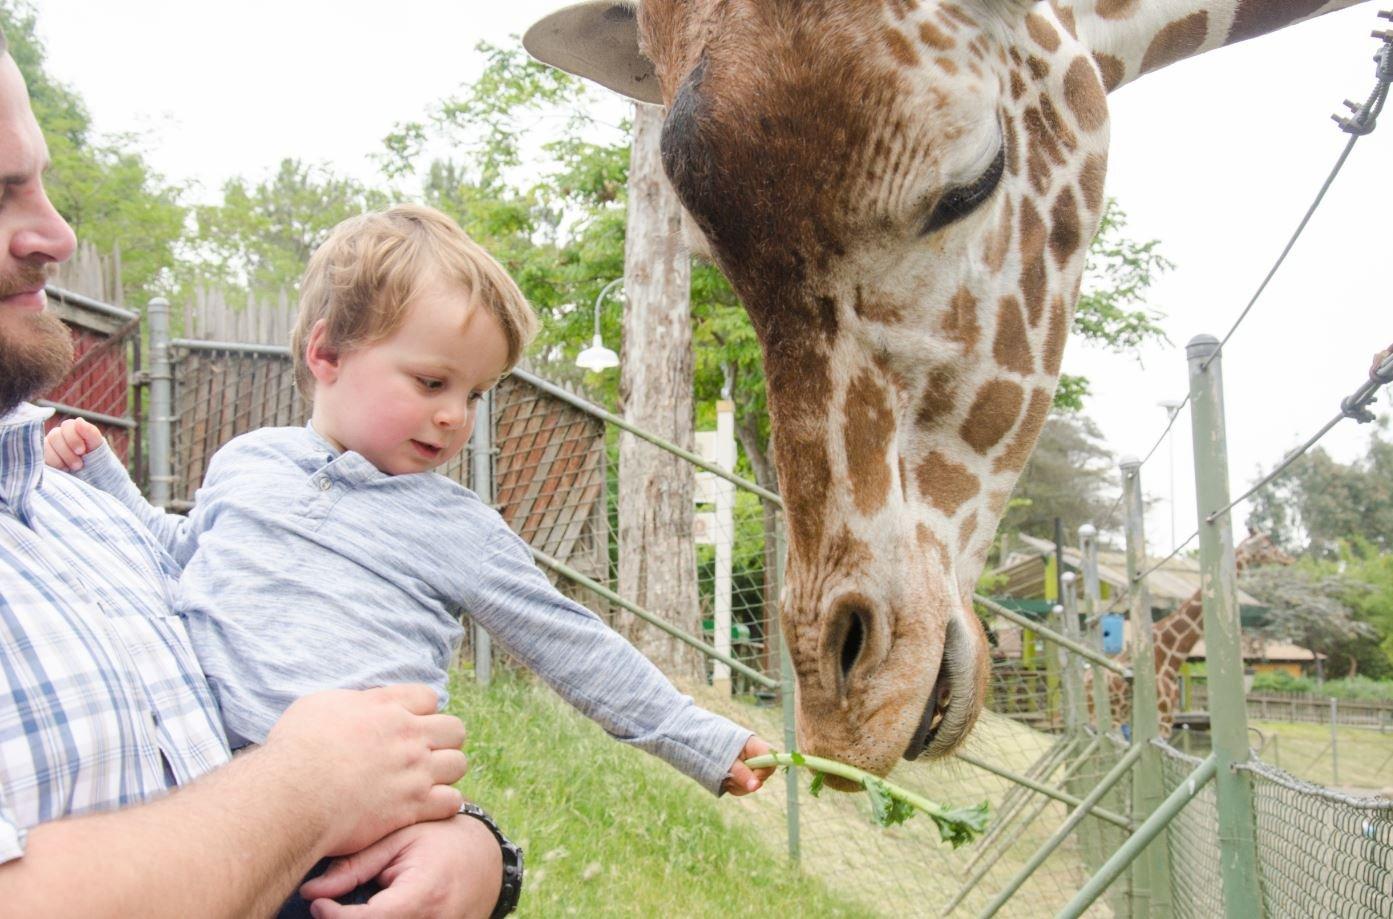 Child feeding giraffe.